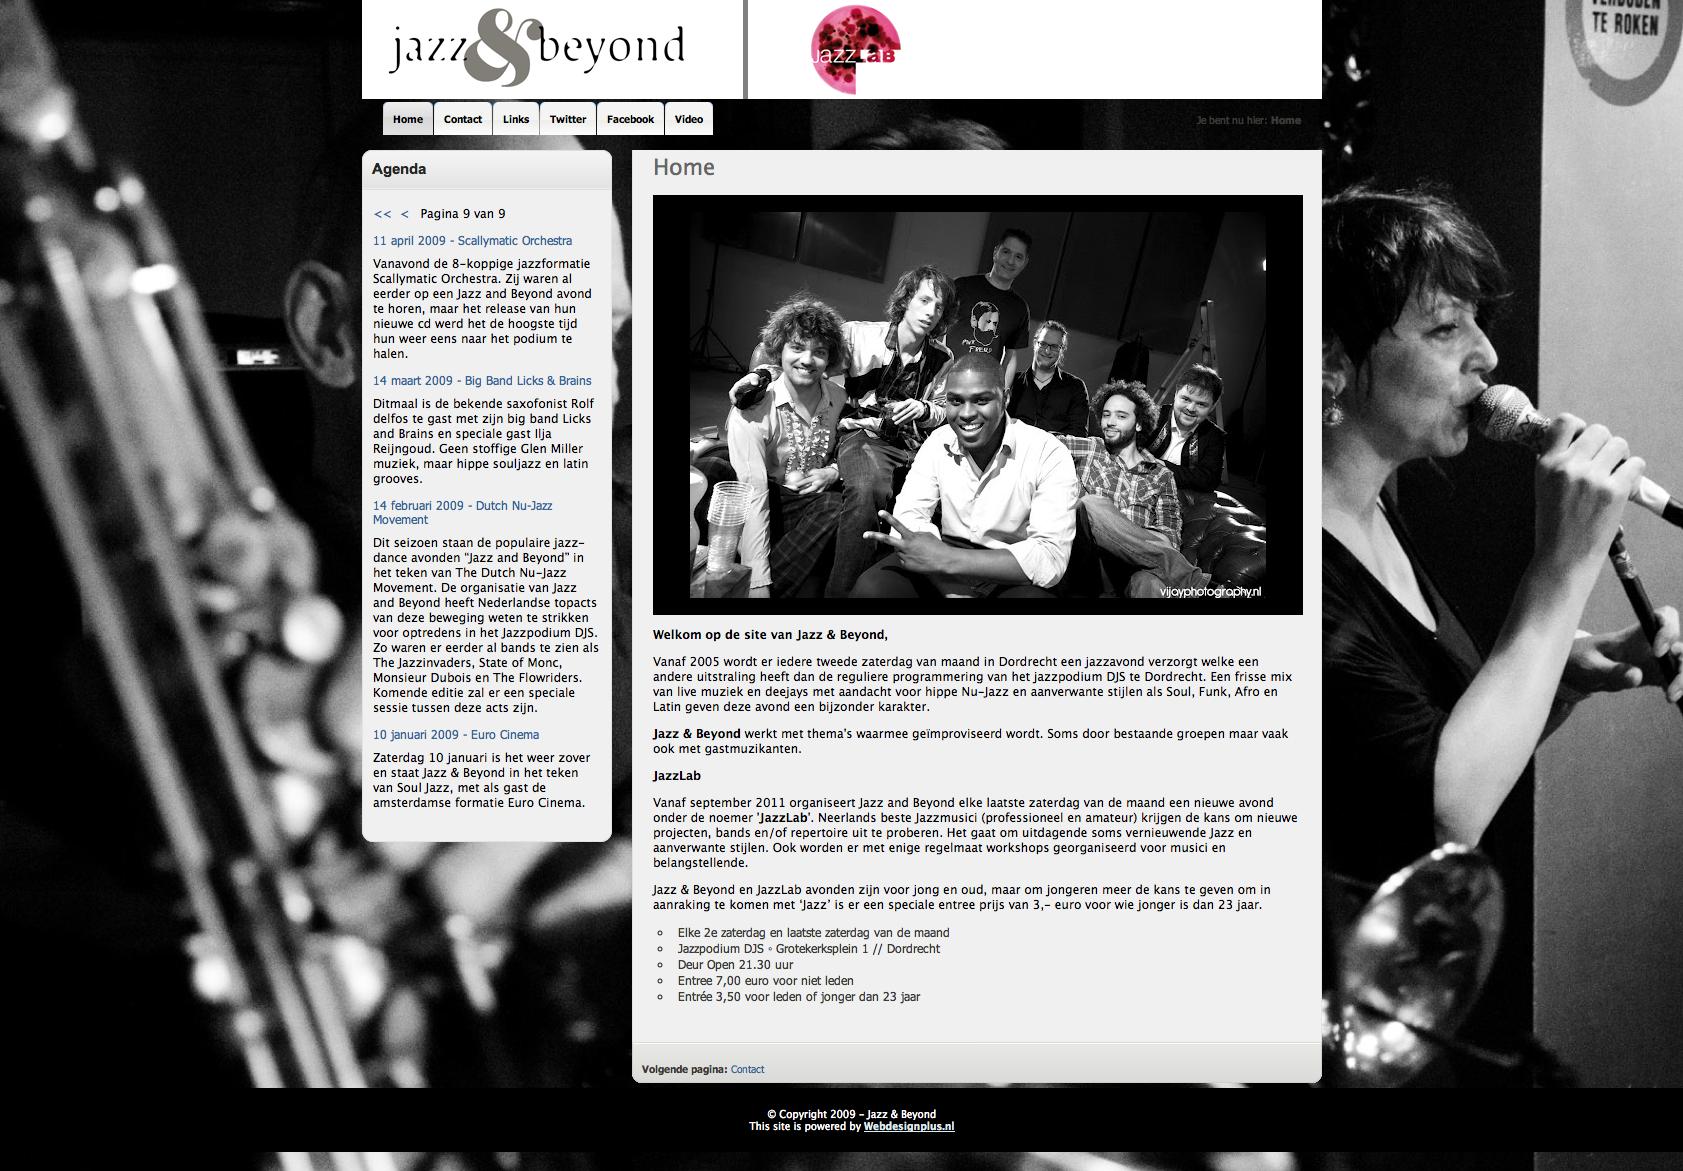 2009 - Jazz & Beyond